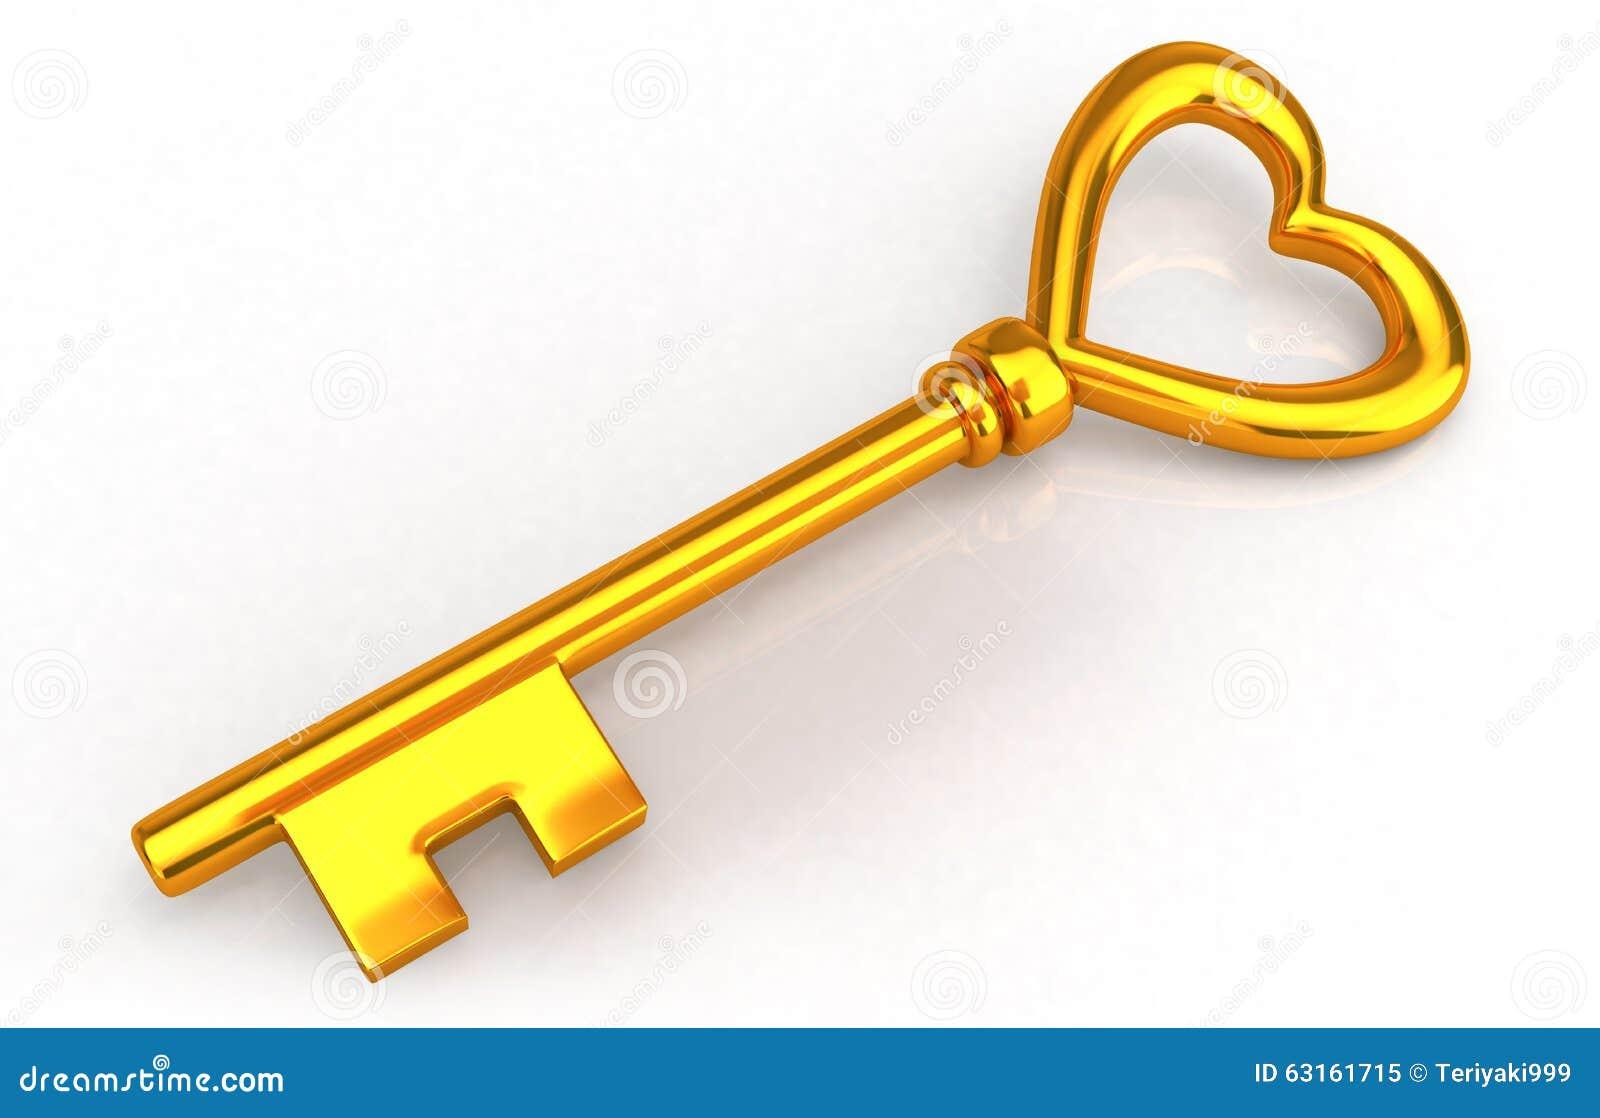 Open Concept House Plans Gold Heart Key Stock Illustration Illustration Of Open